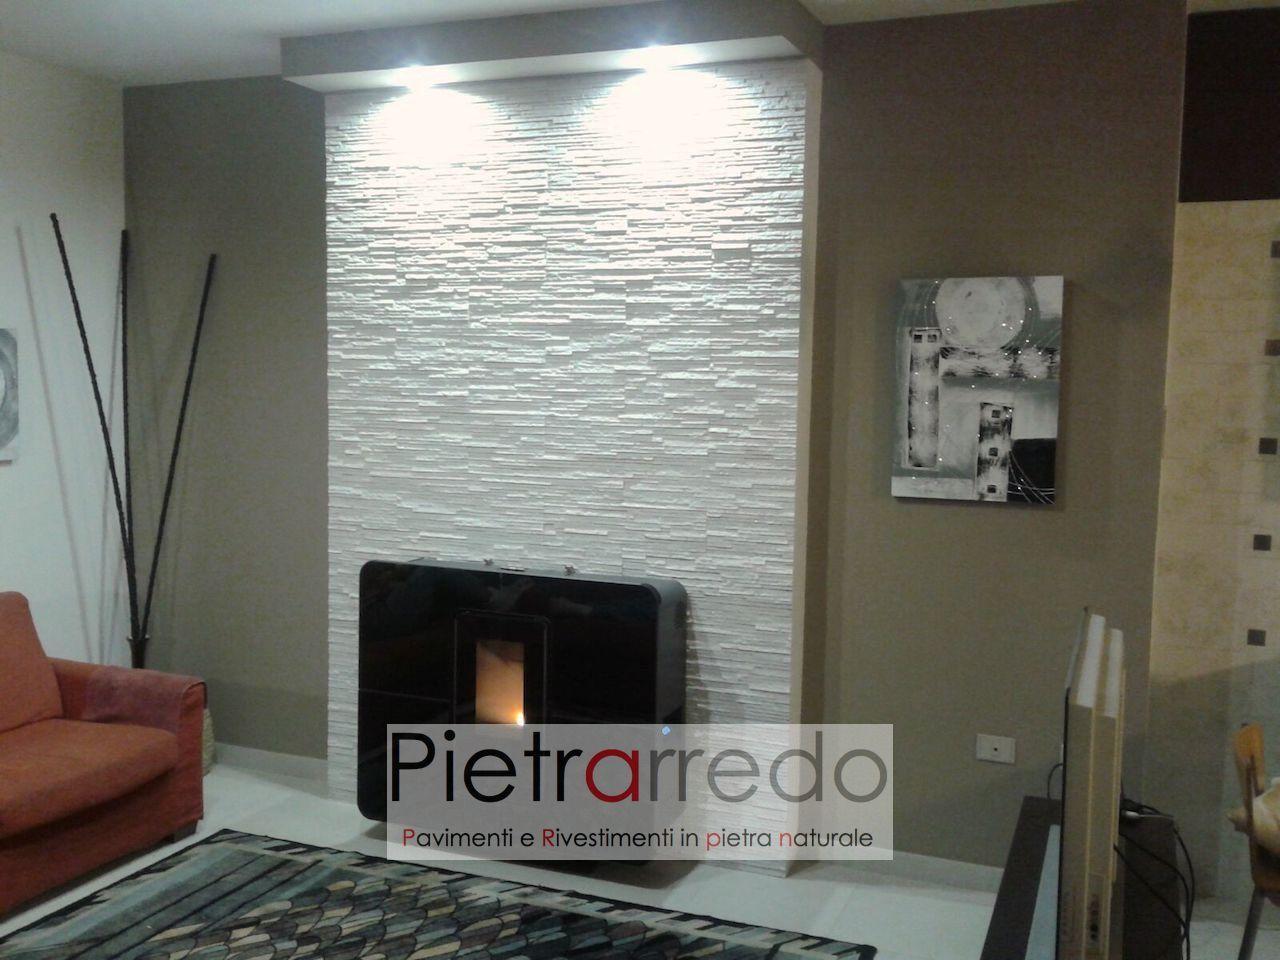 Pietre Bianca Per Interni rivestimento pietra quarzite bianca slim -50% costo €62/mq